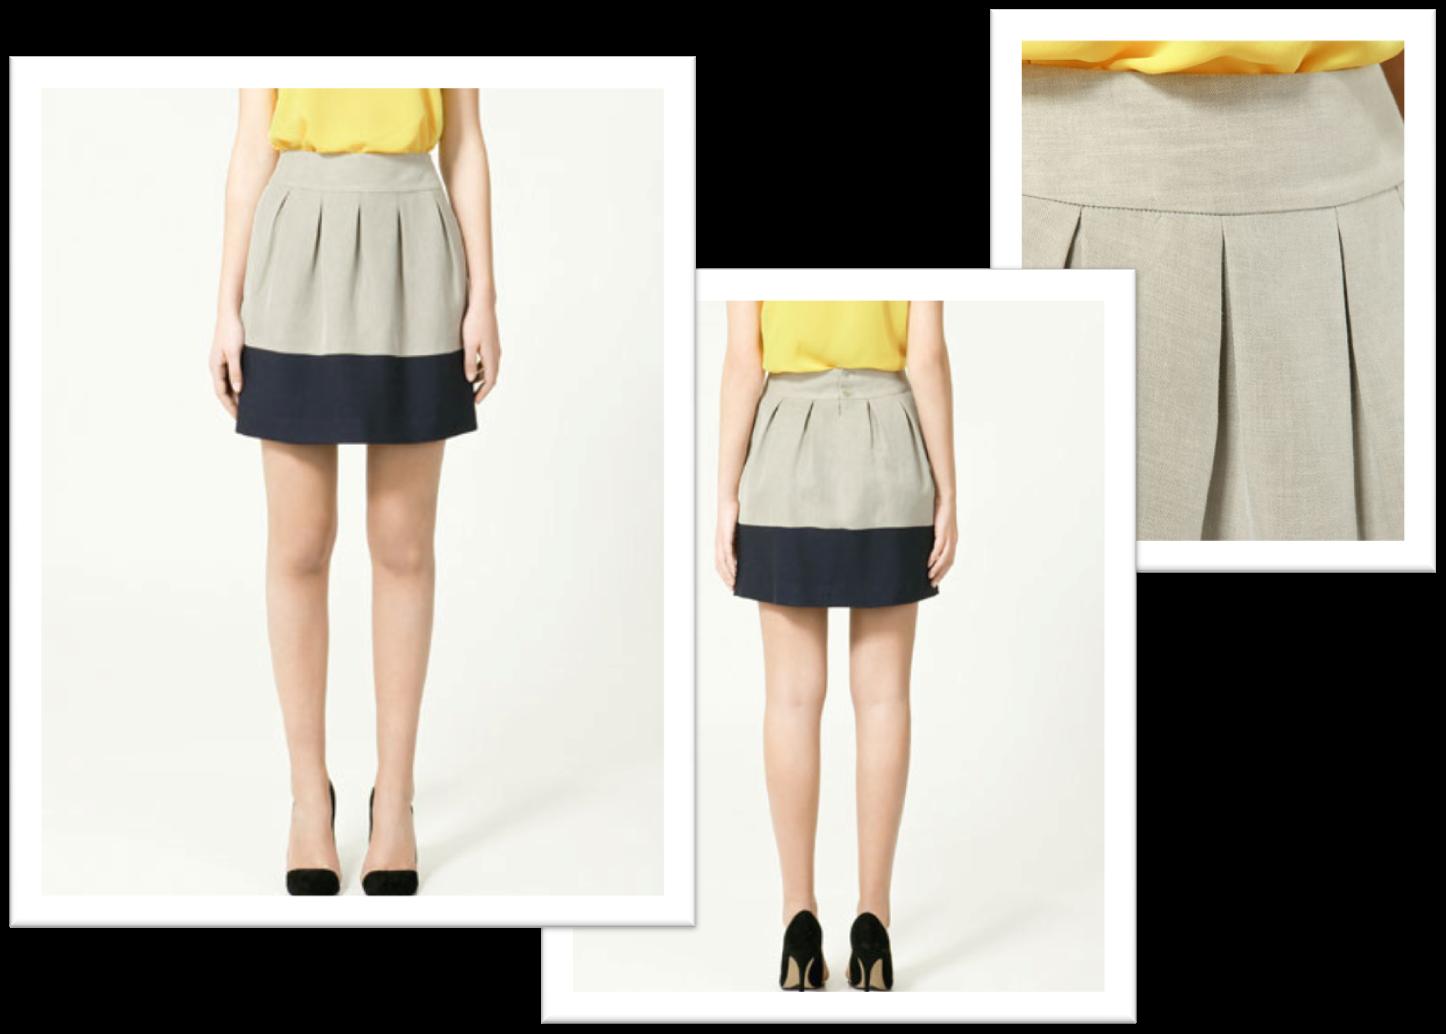 bloggers blog: my chic suggestions: ZARA skirt